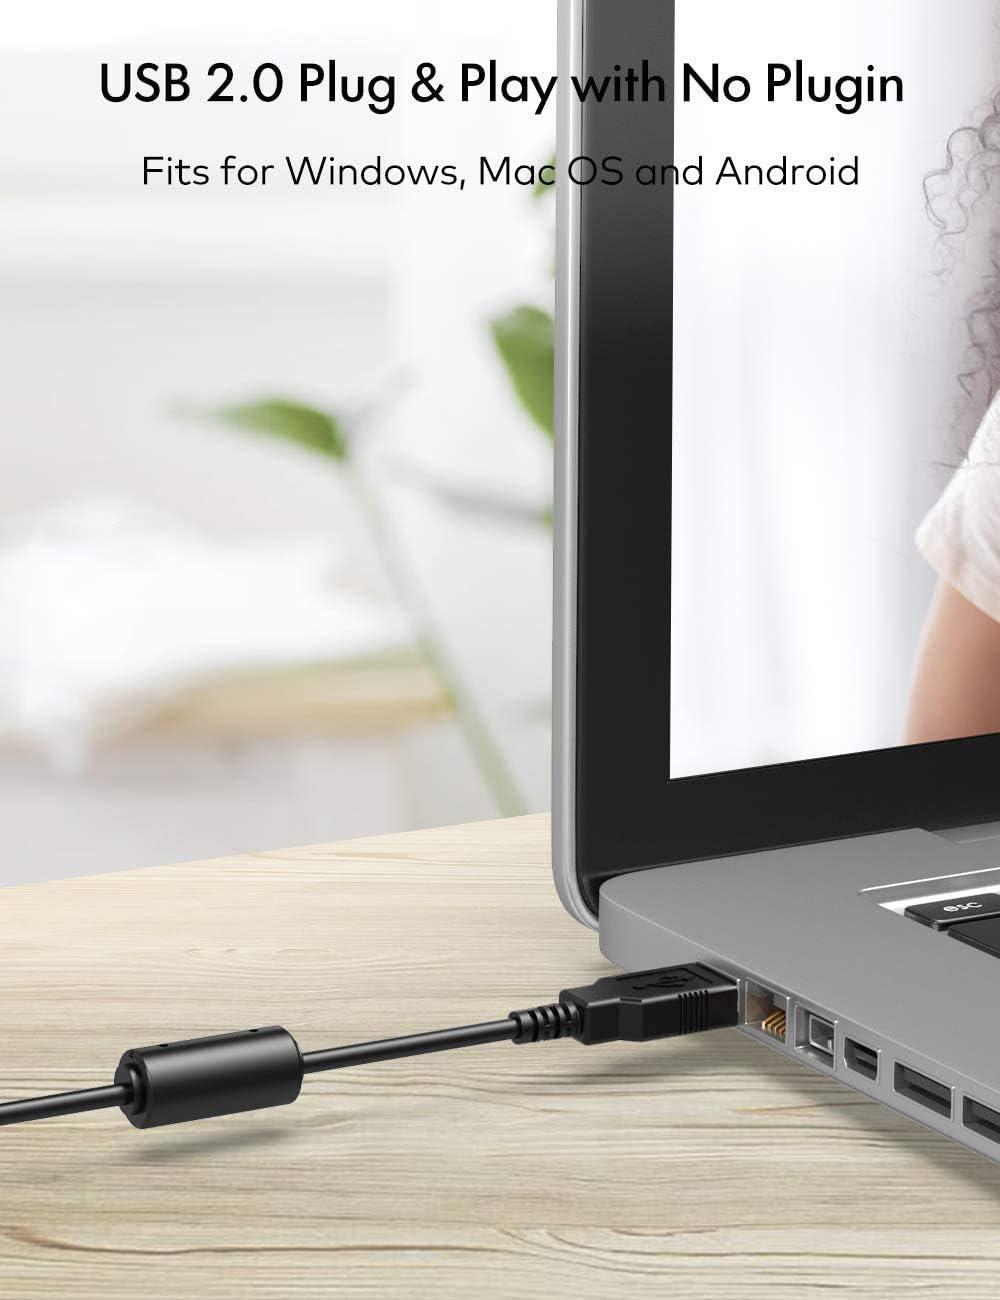 conferencias grabaci/ón Roffie C/ámara Web Full HD 1080P con micr/ófono Estudios computadora port/átil PC Webcam de Escritorio USB 2.0 Webcam para videollamadas Juegos con Clip Giratorio